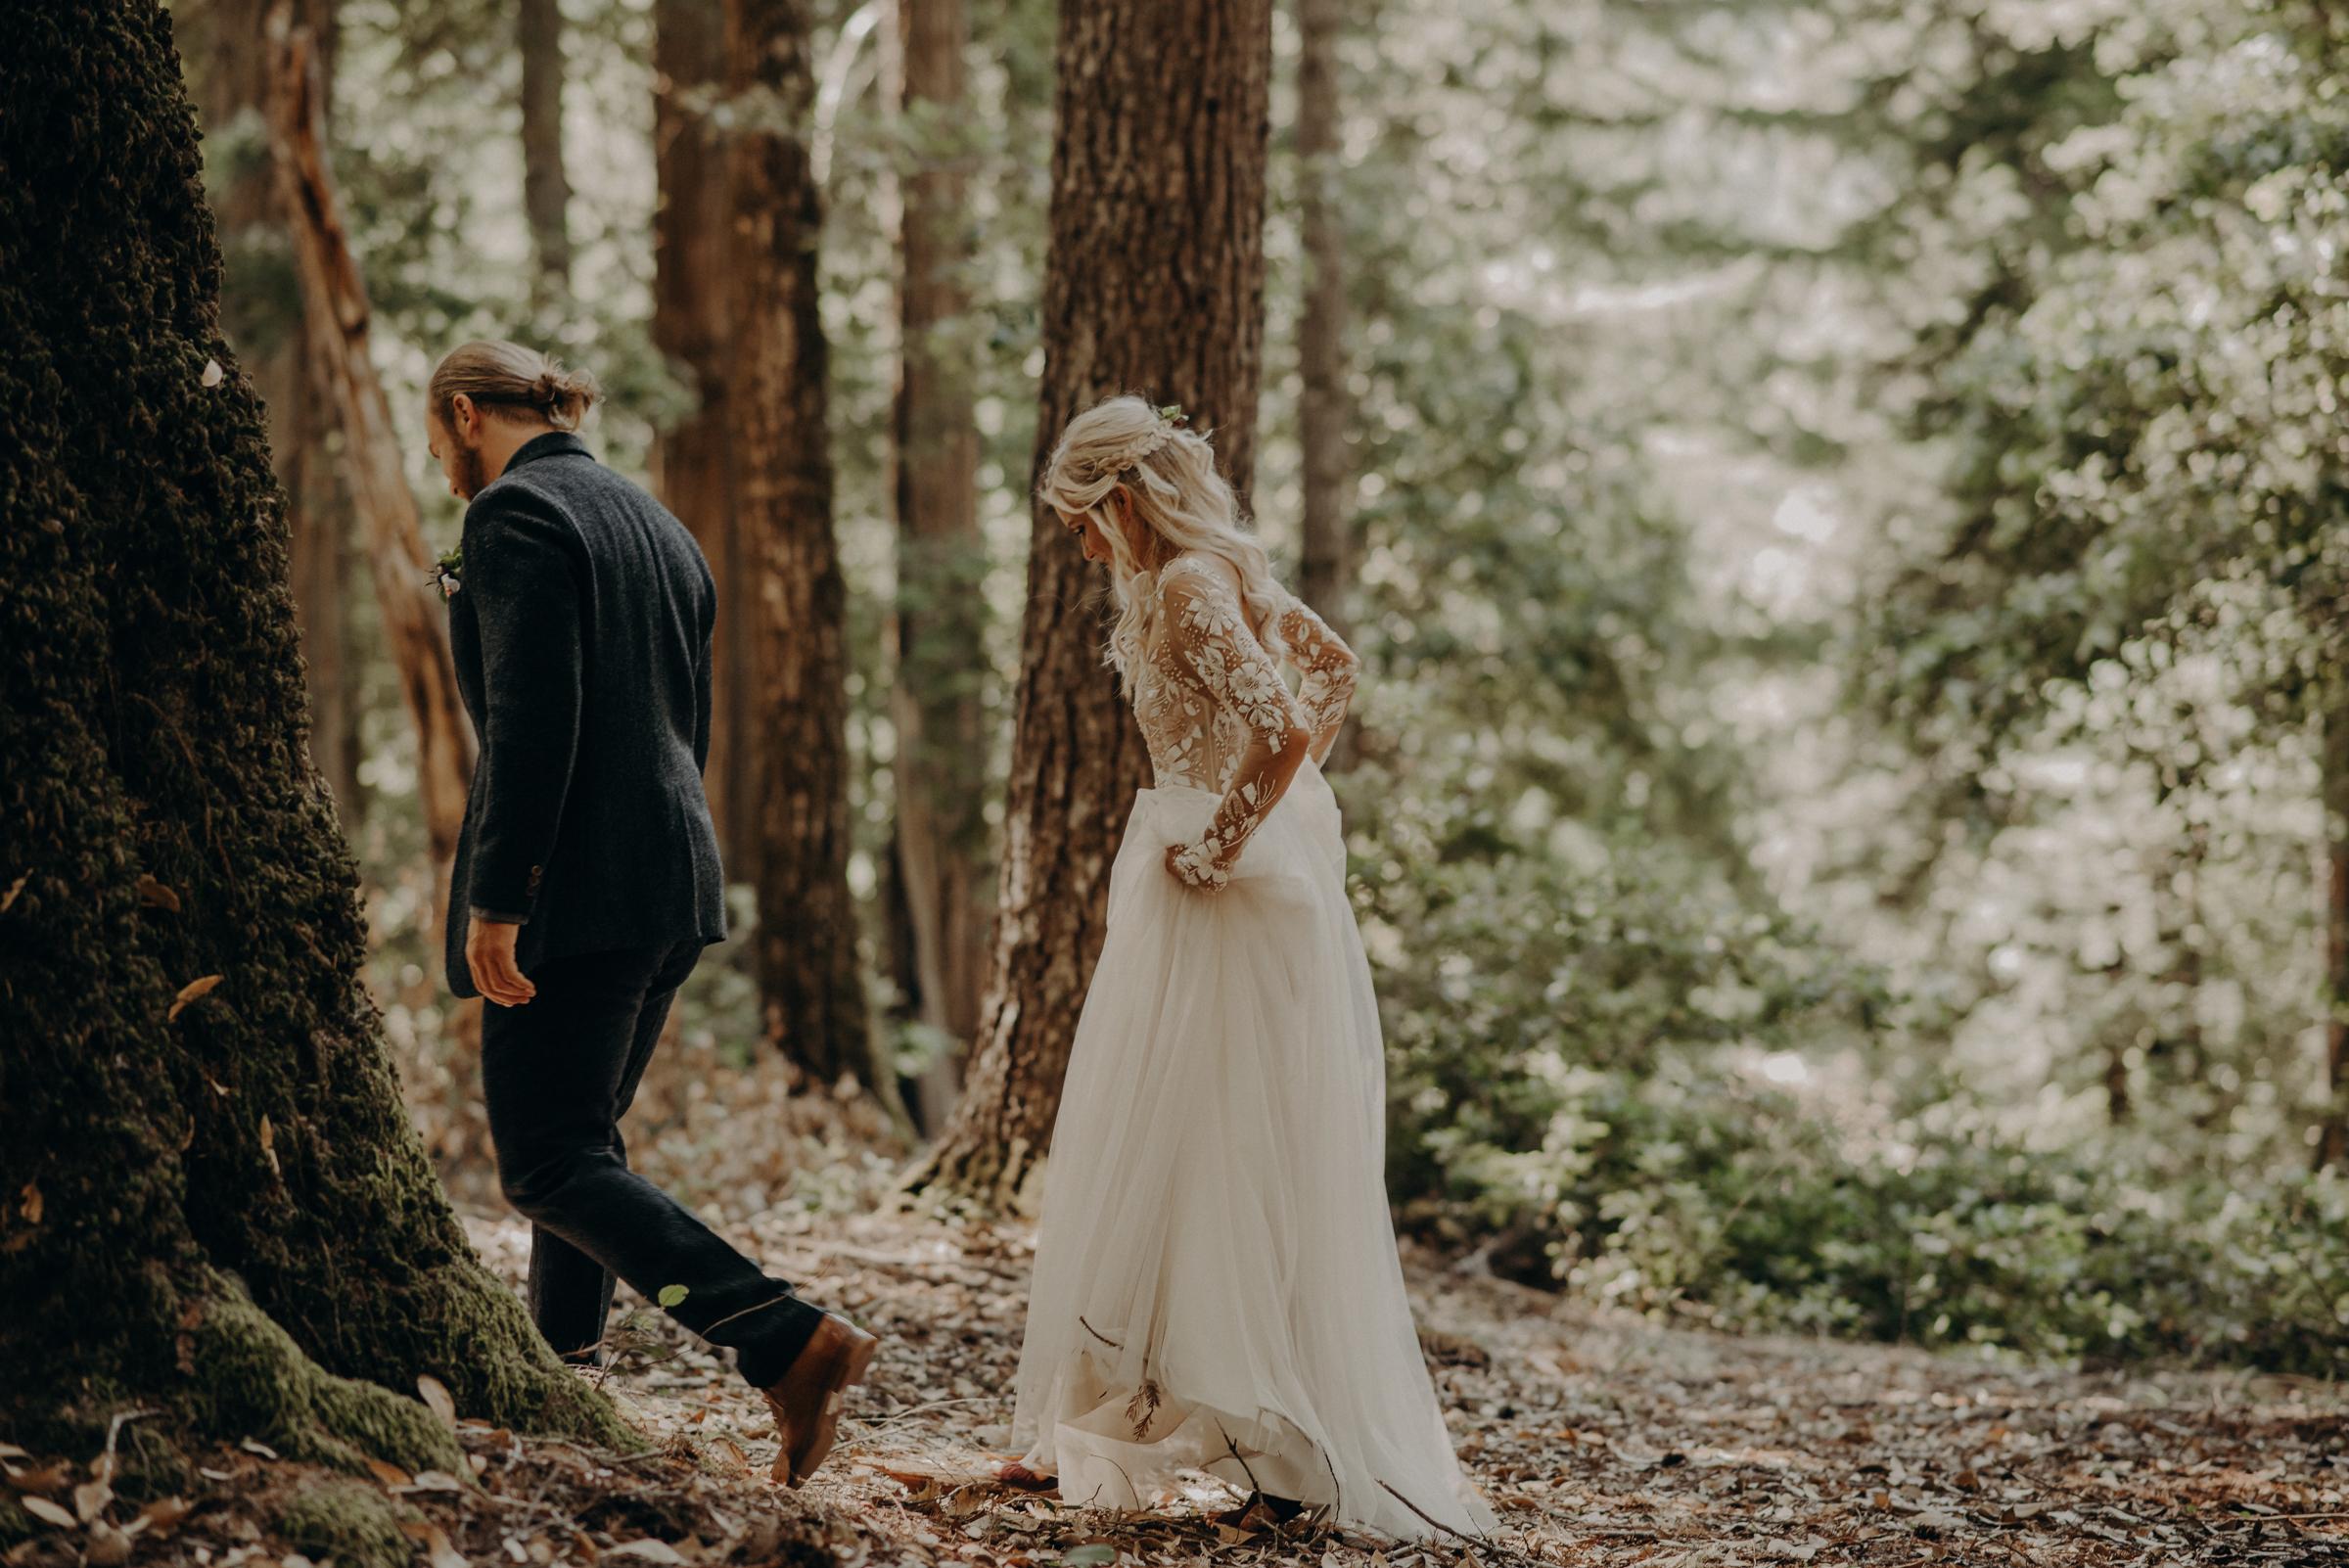 IsaiahAndTaylor.com - California Destination Elopement, Lake Leonard Reserve Wedding, Ukiah-069.jpg